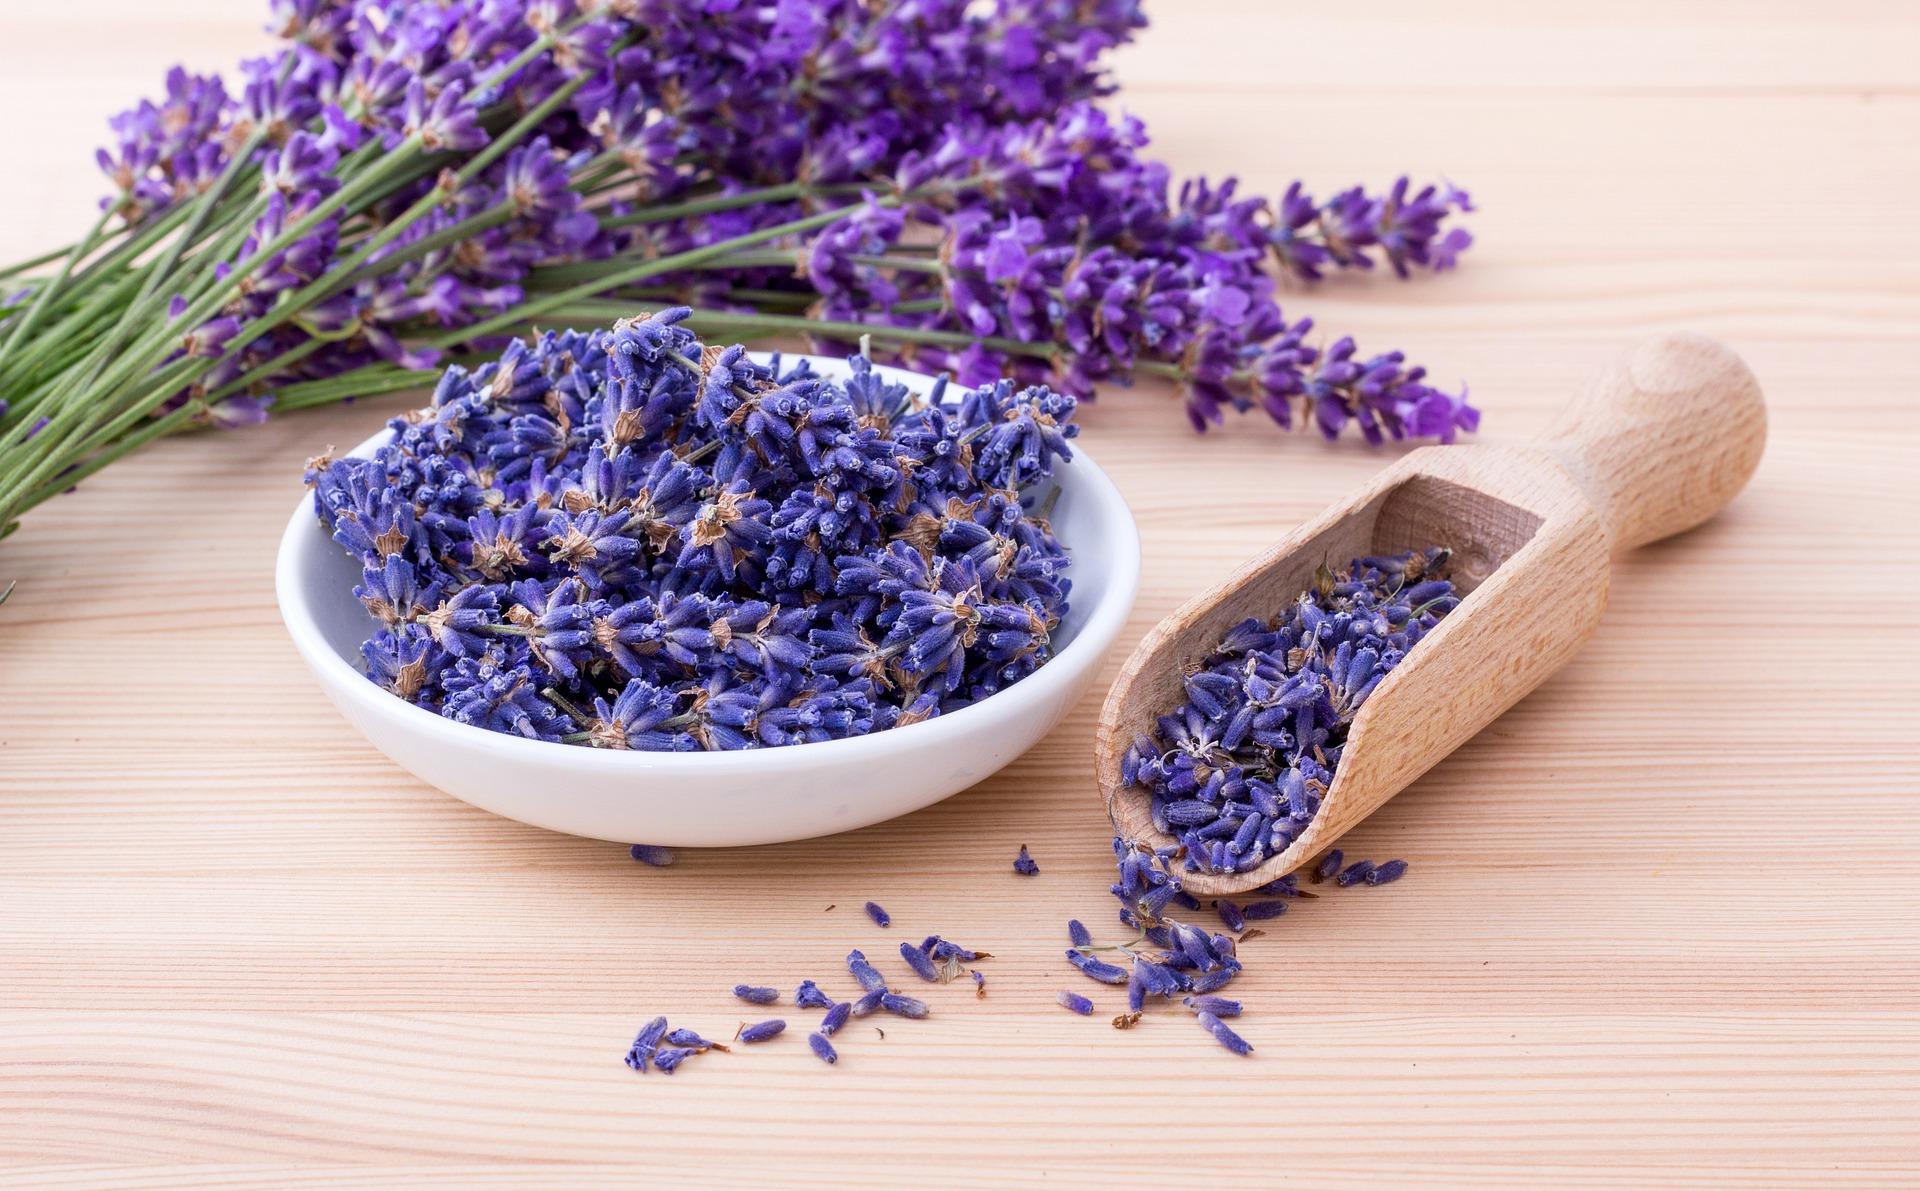 lavender-6097821_1920